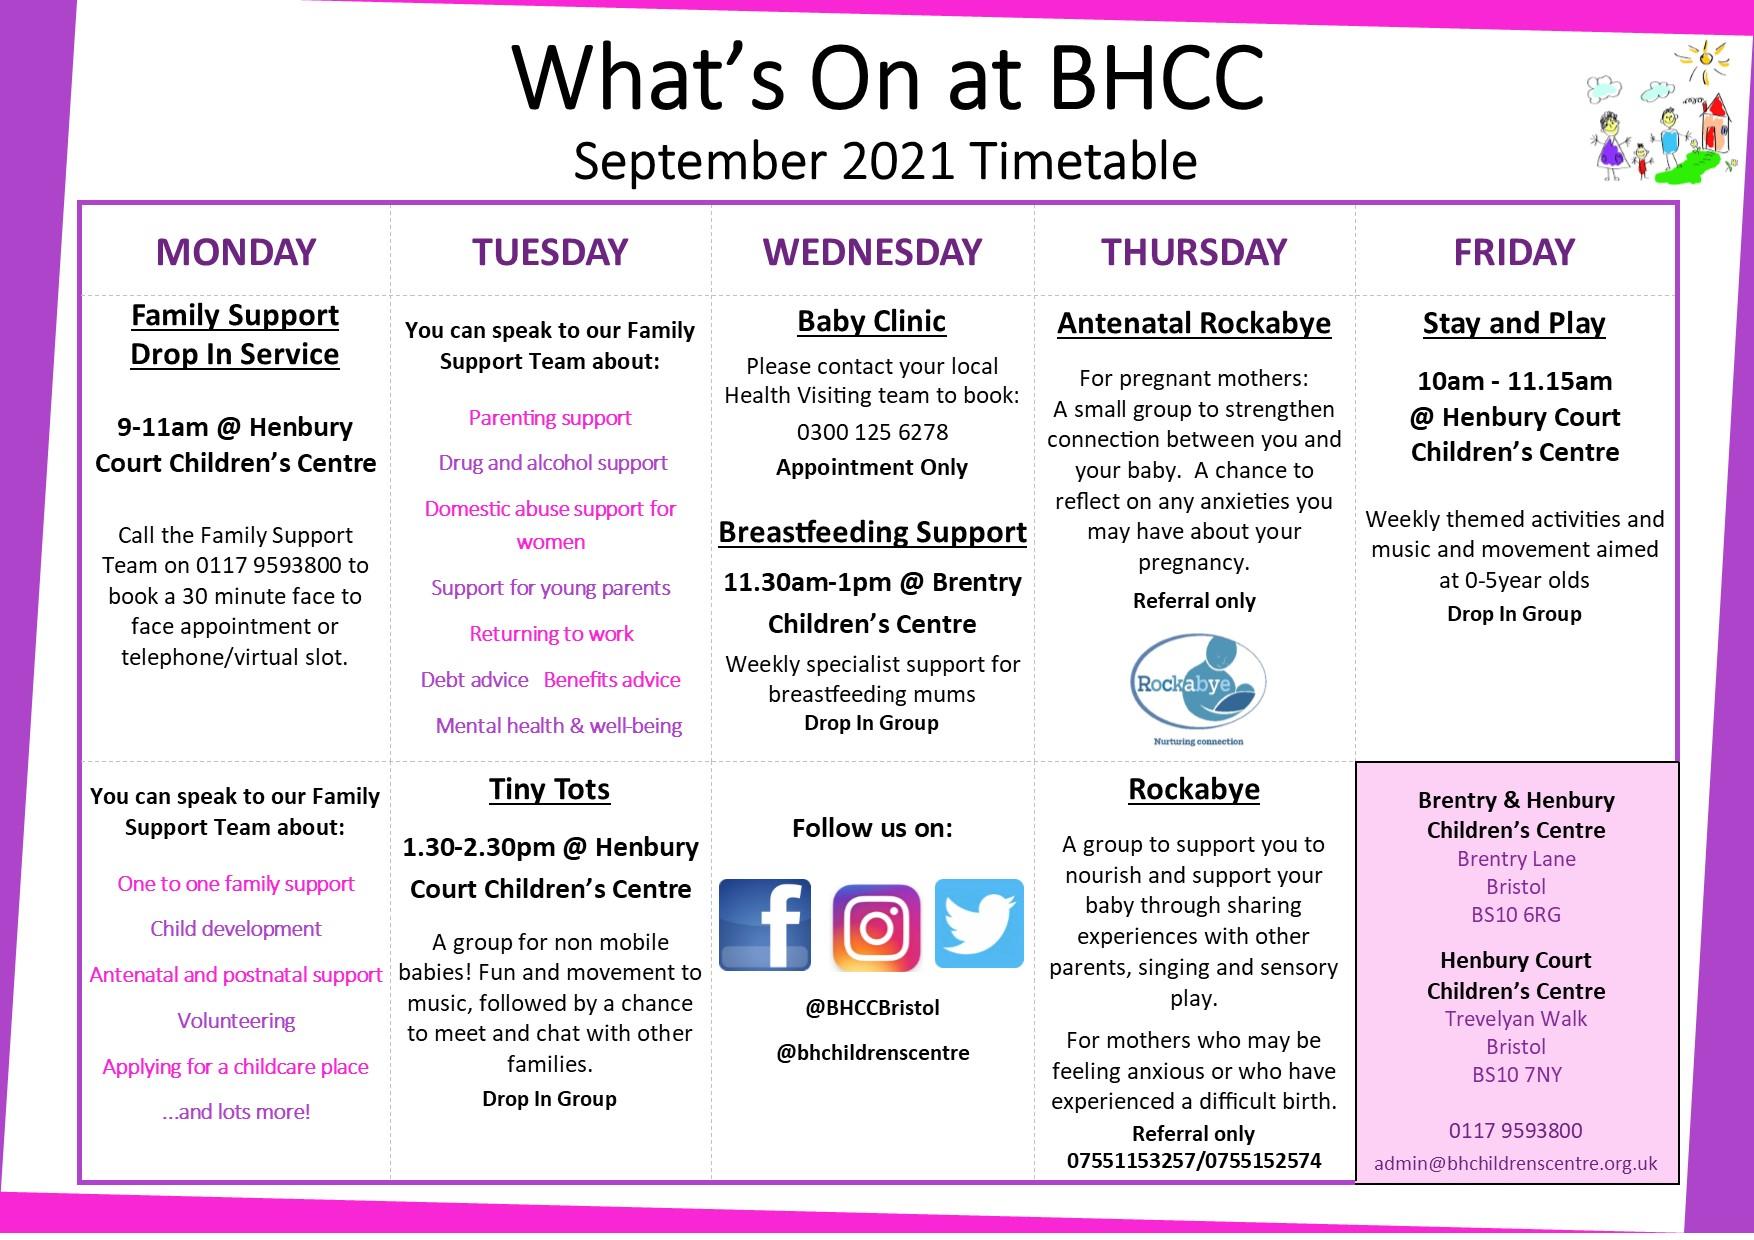 BHCC Timetable September 2021